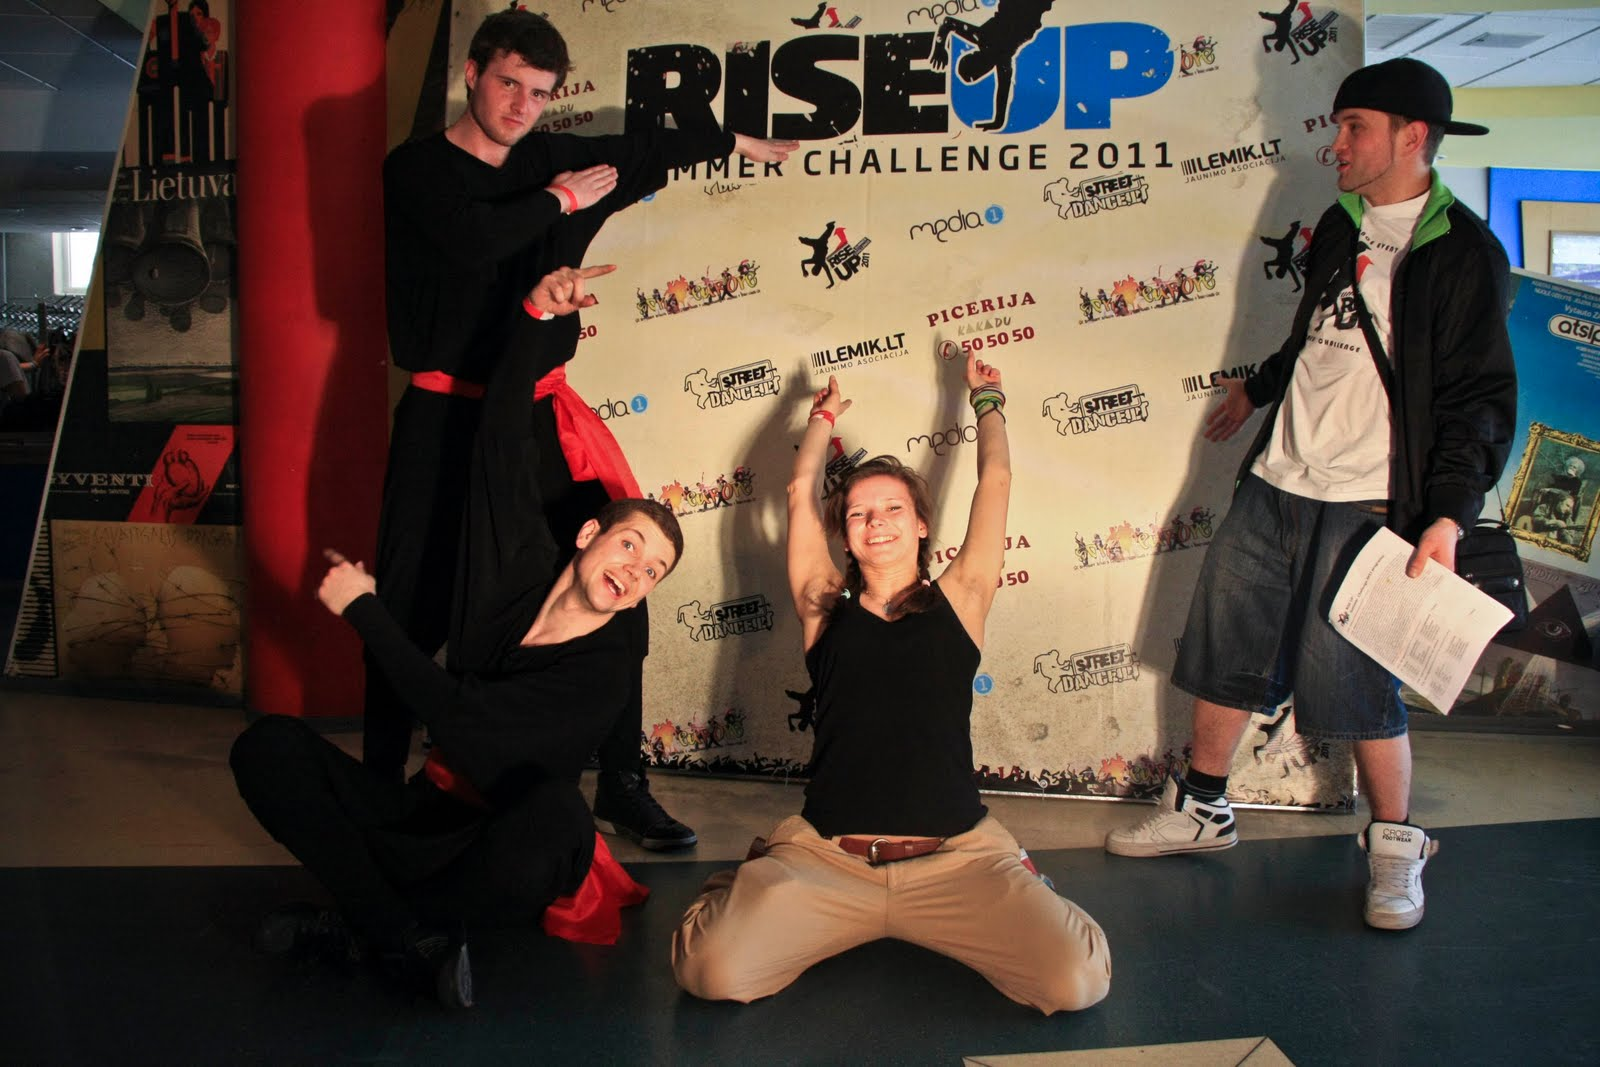 Rise Up - IMG_1012.jpg